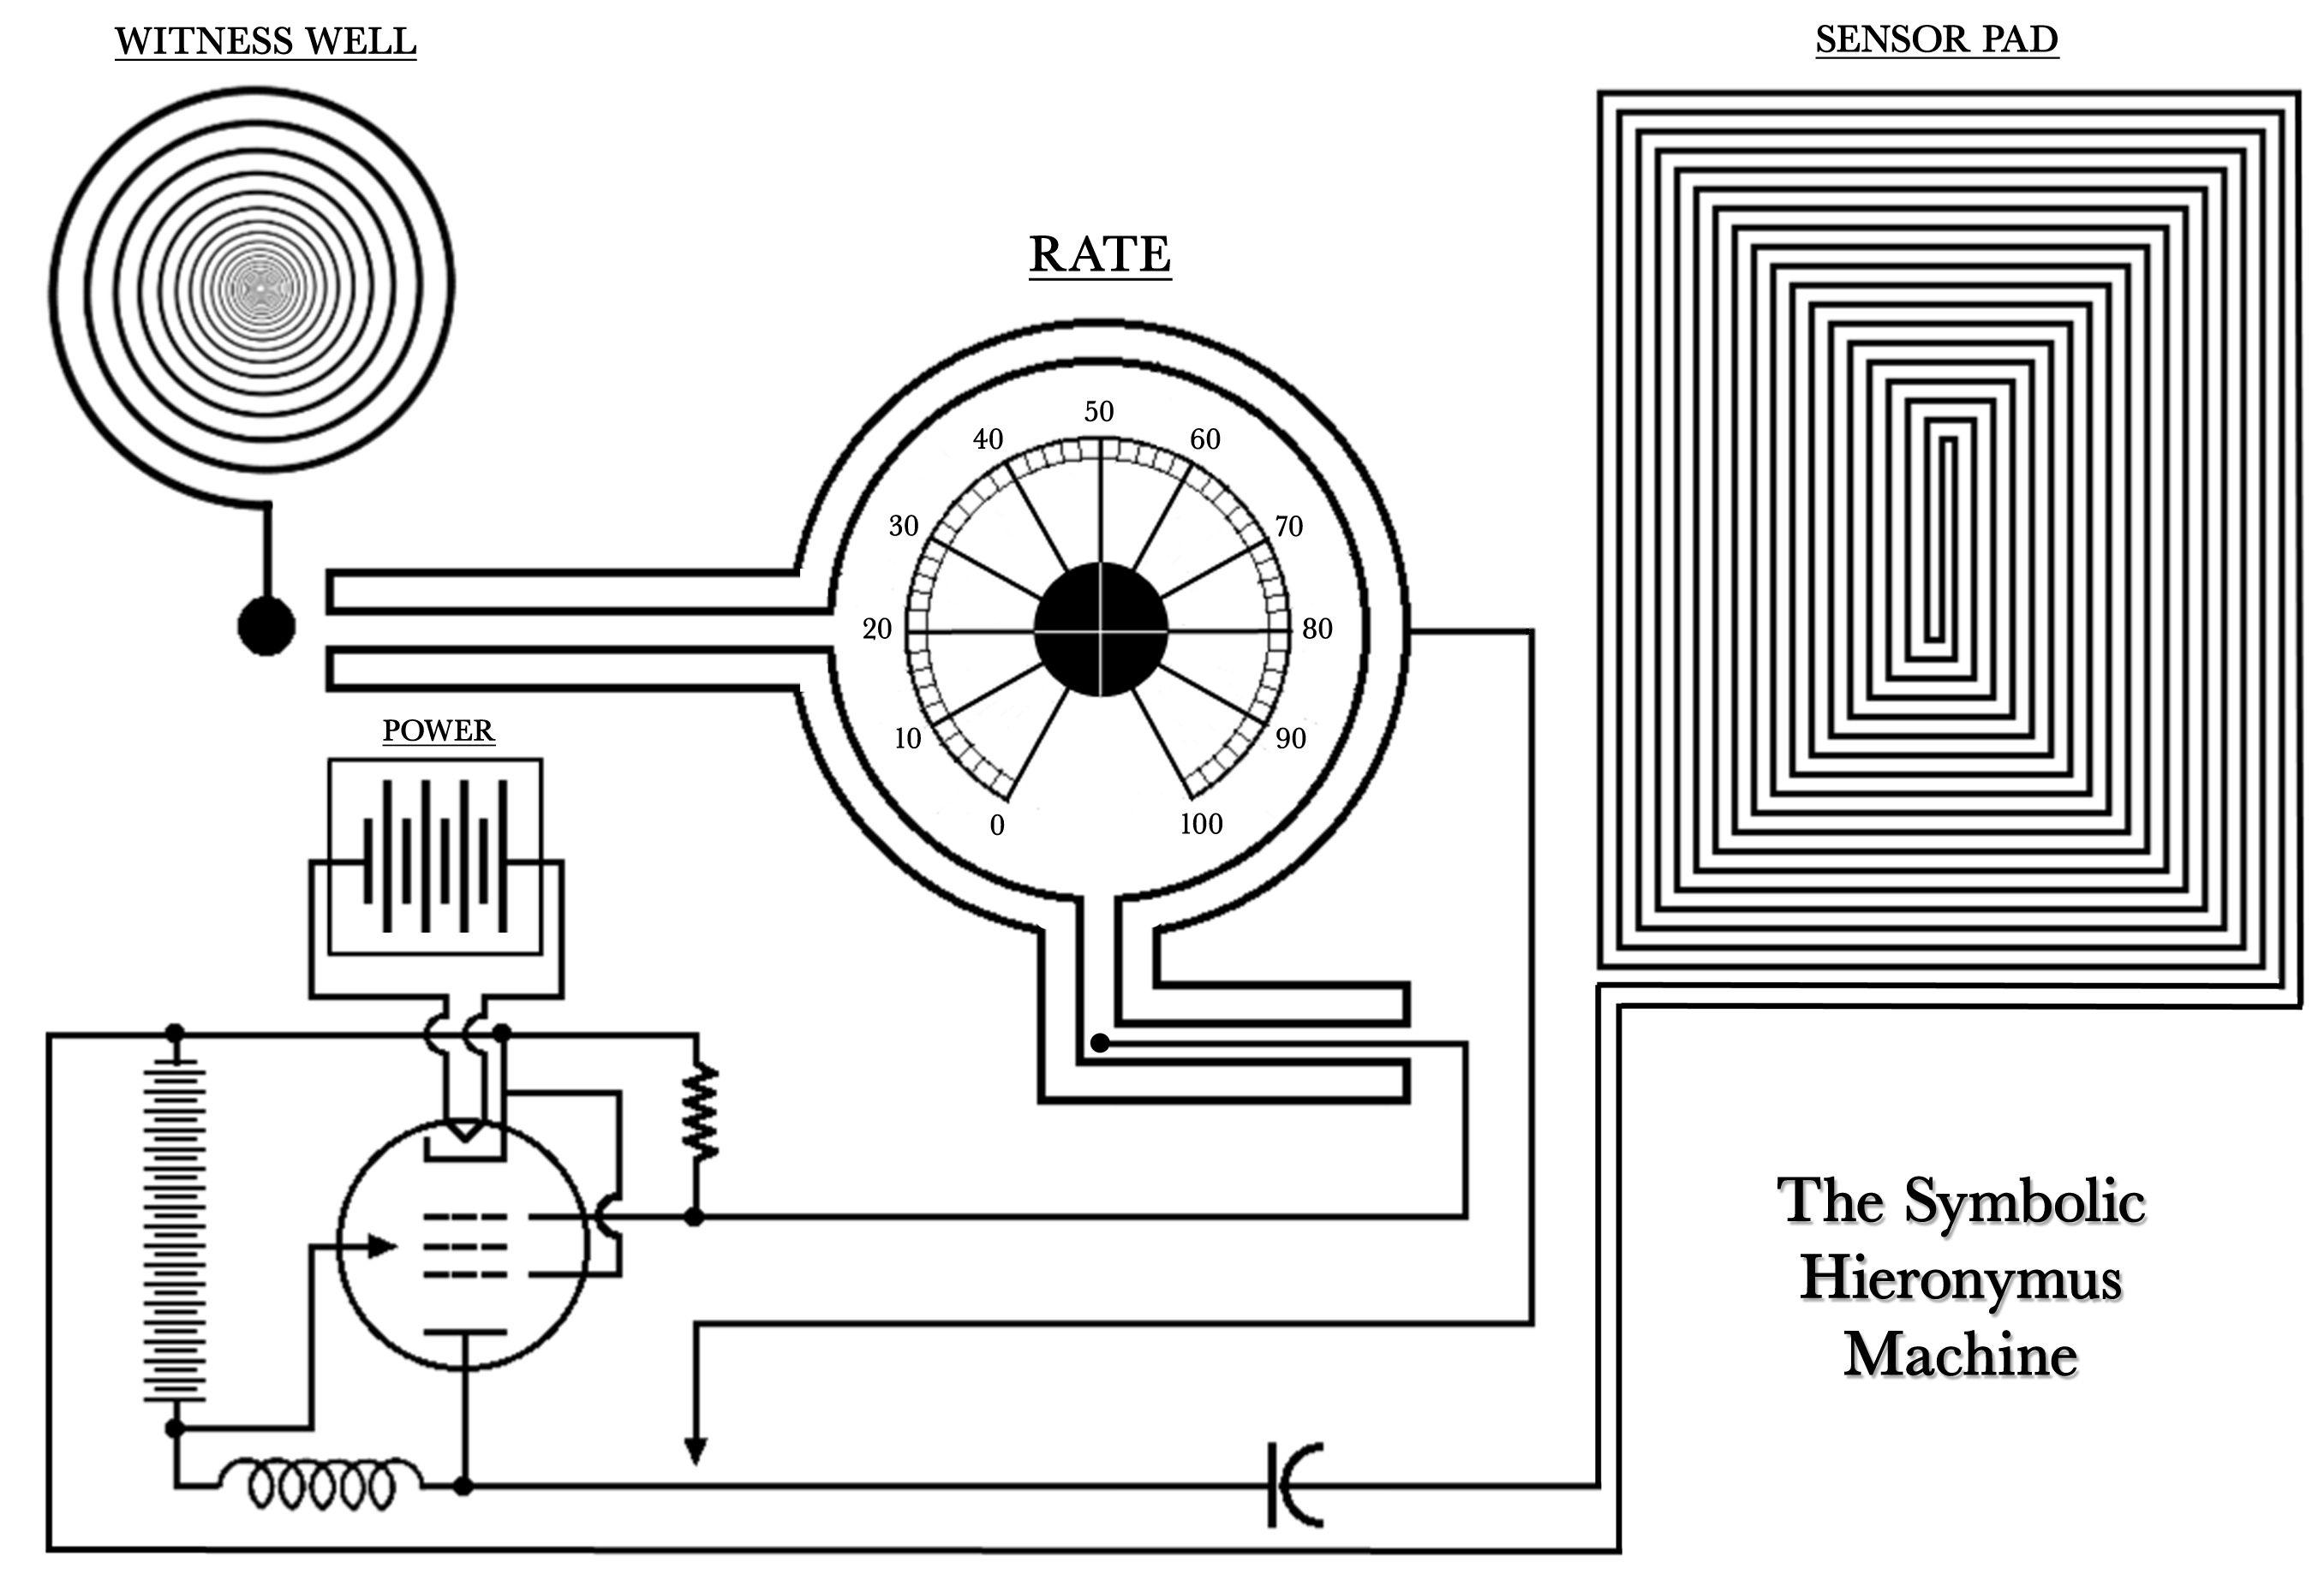 659e0975552be1ee57f12f1ad3ee5c79 Radionics Schematics on wishing machine walmart, albert abrams, fire alarm, rates list,